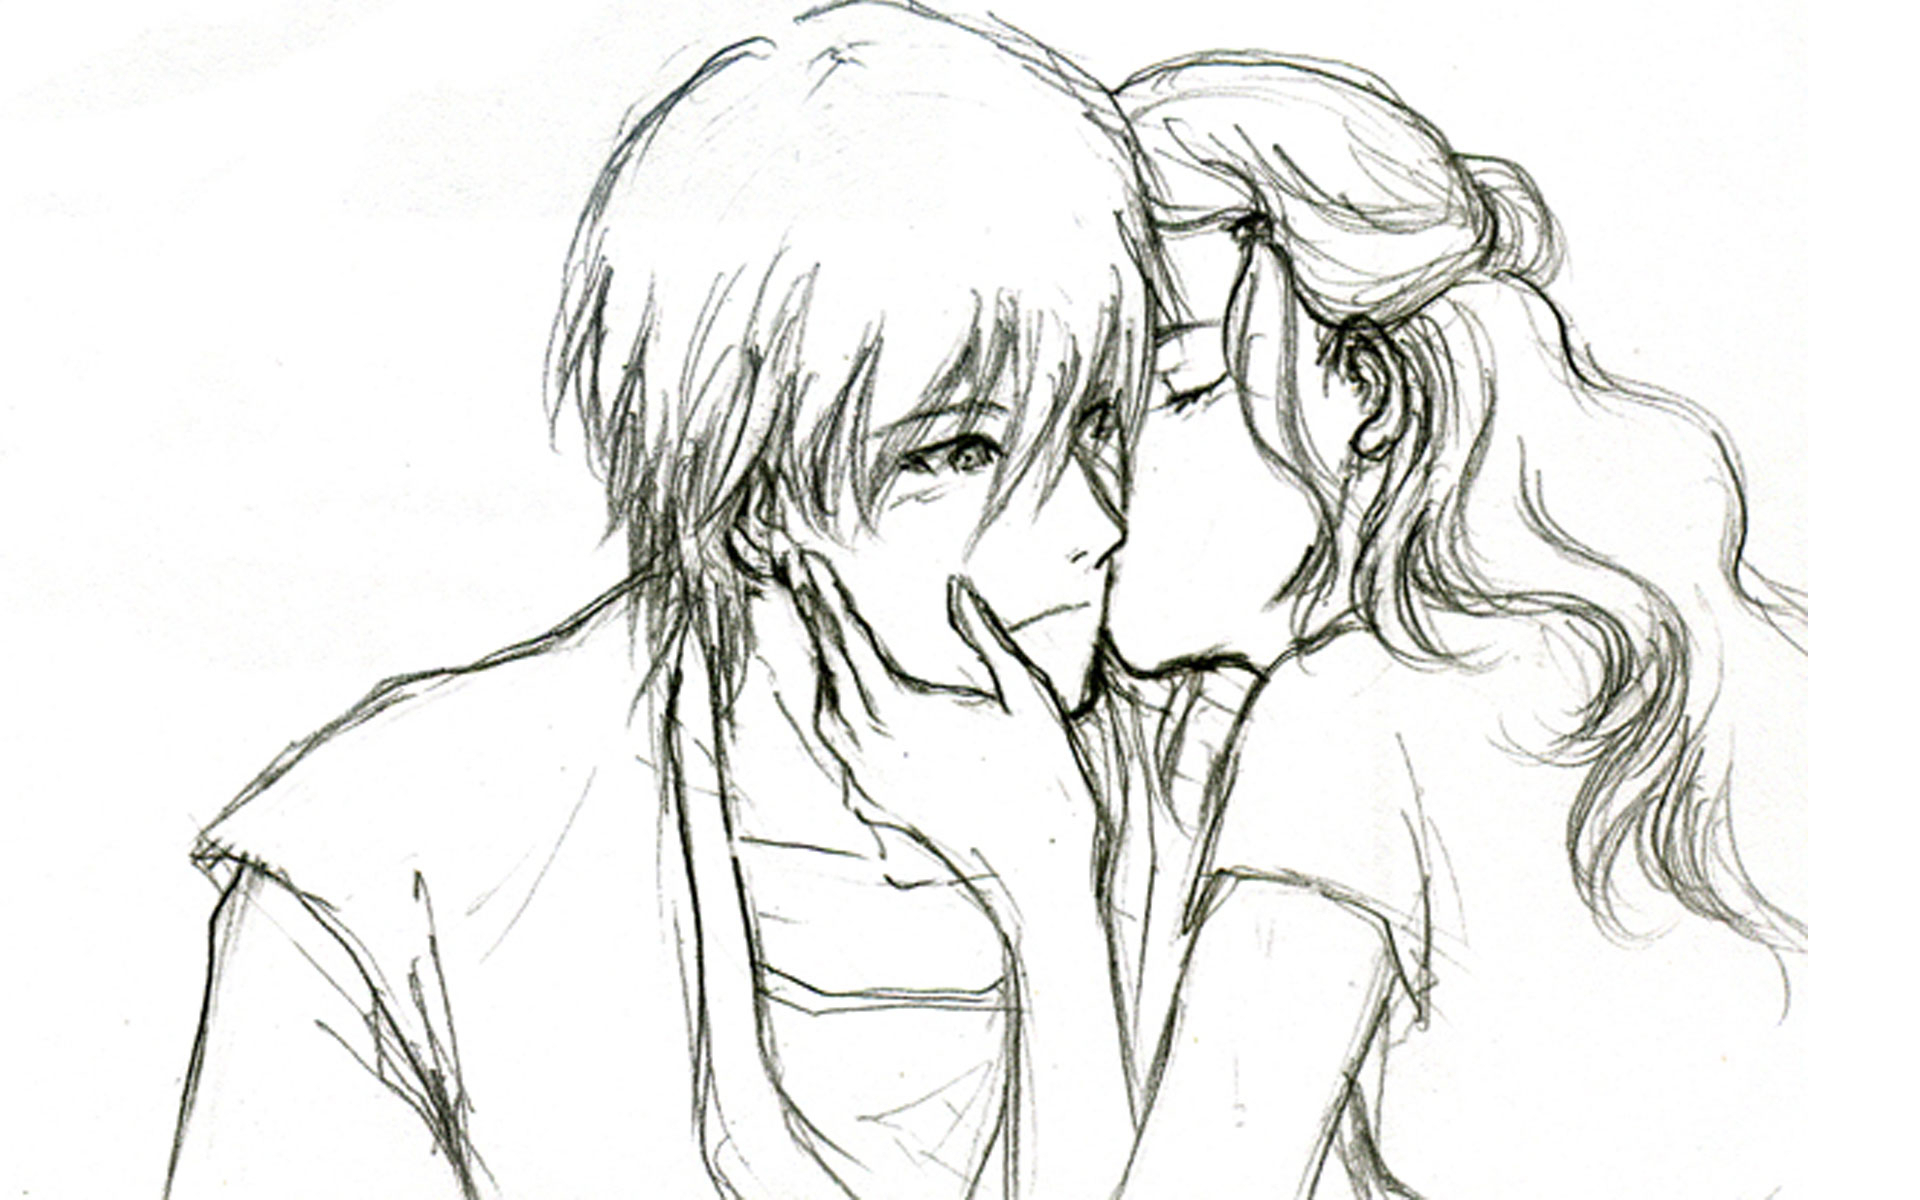 1920x1200 Hugging In Bed Drawings Drawn Hug Lover Romantic